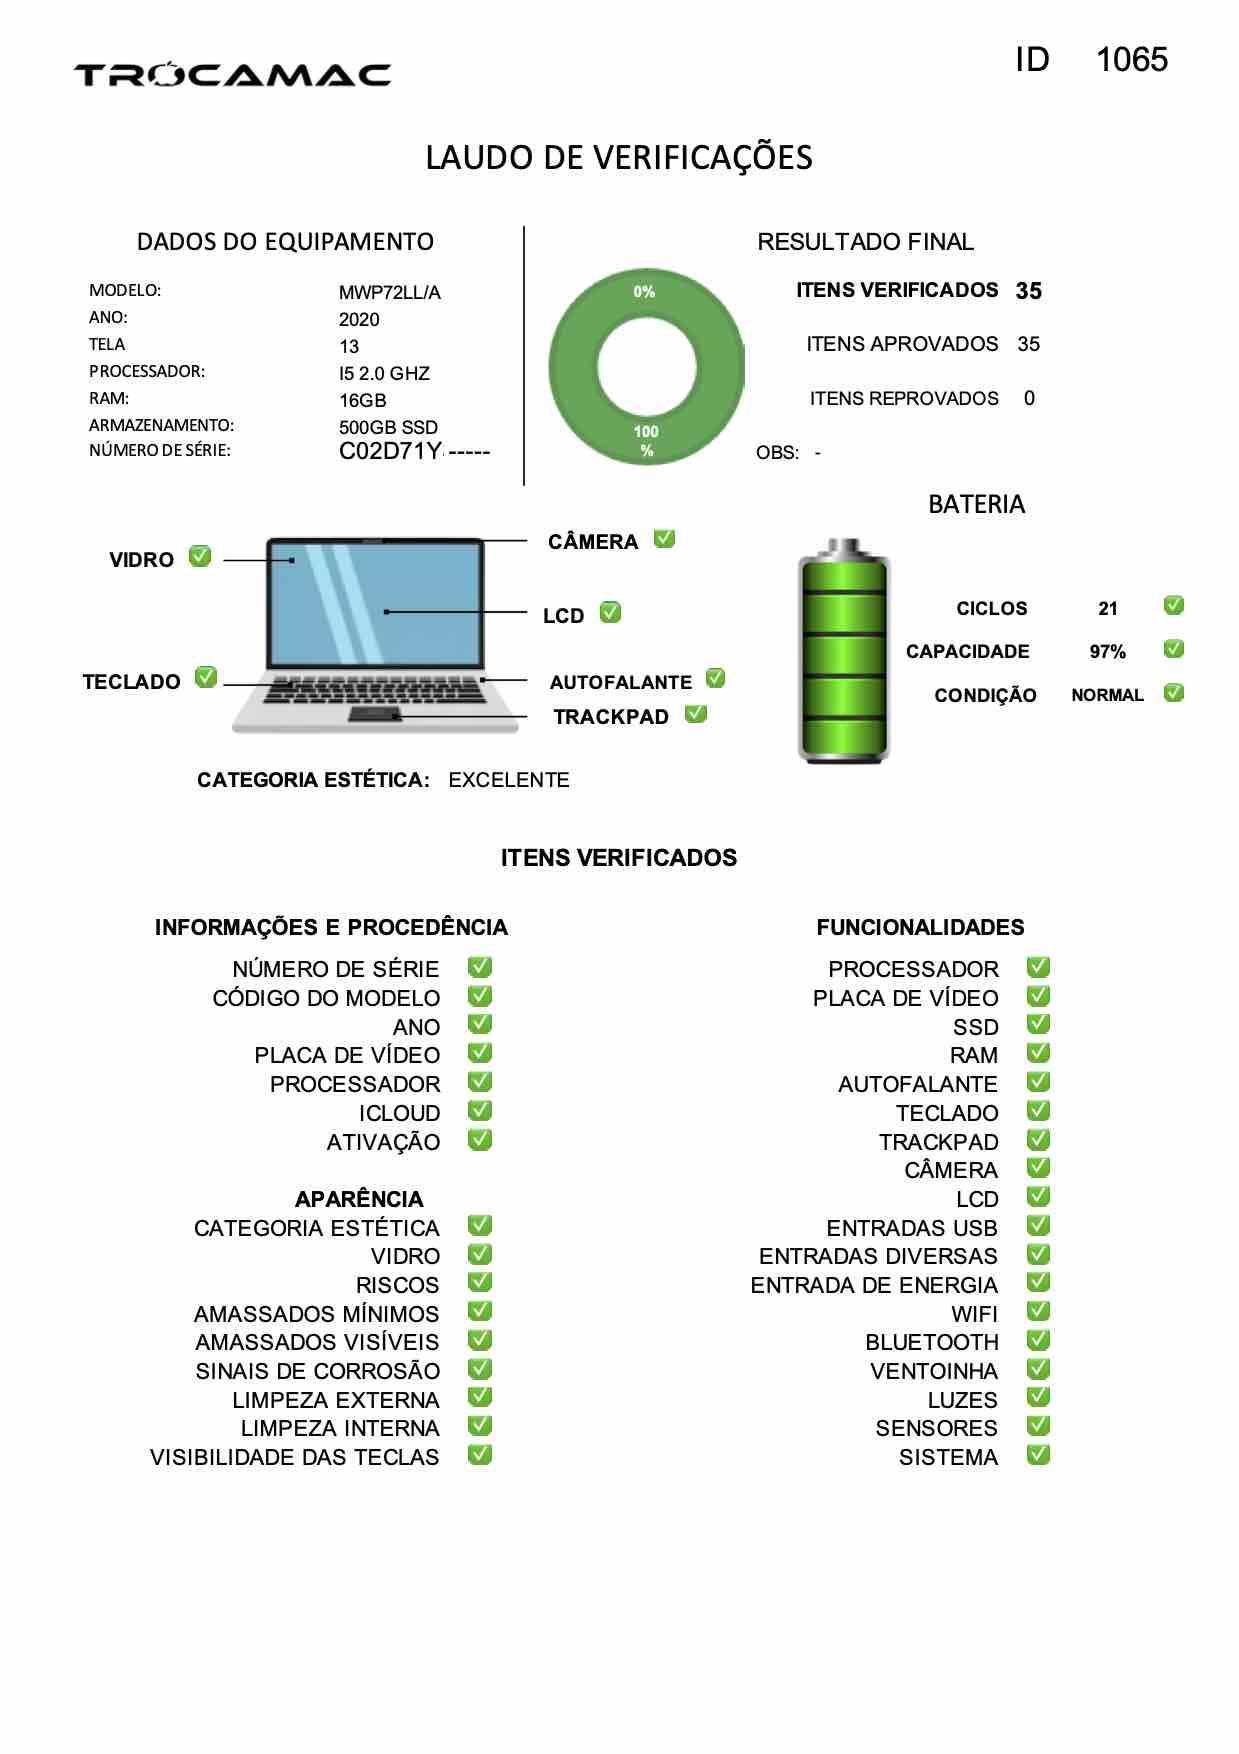 Macbook Pro 13 Space Grey i5 2.0Ghz 16GB 512GB SSD MWP72LL/A Seminovo